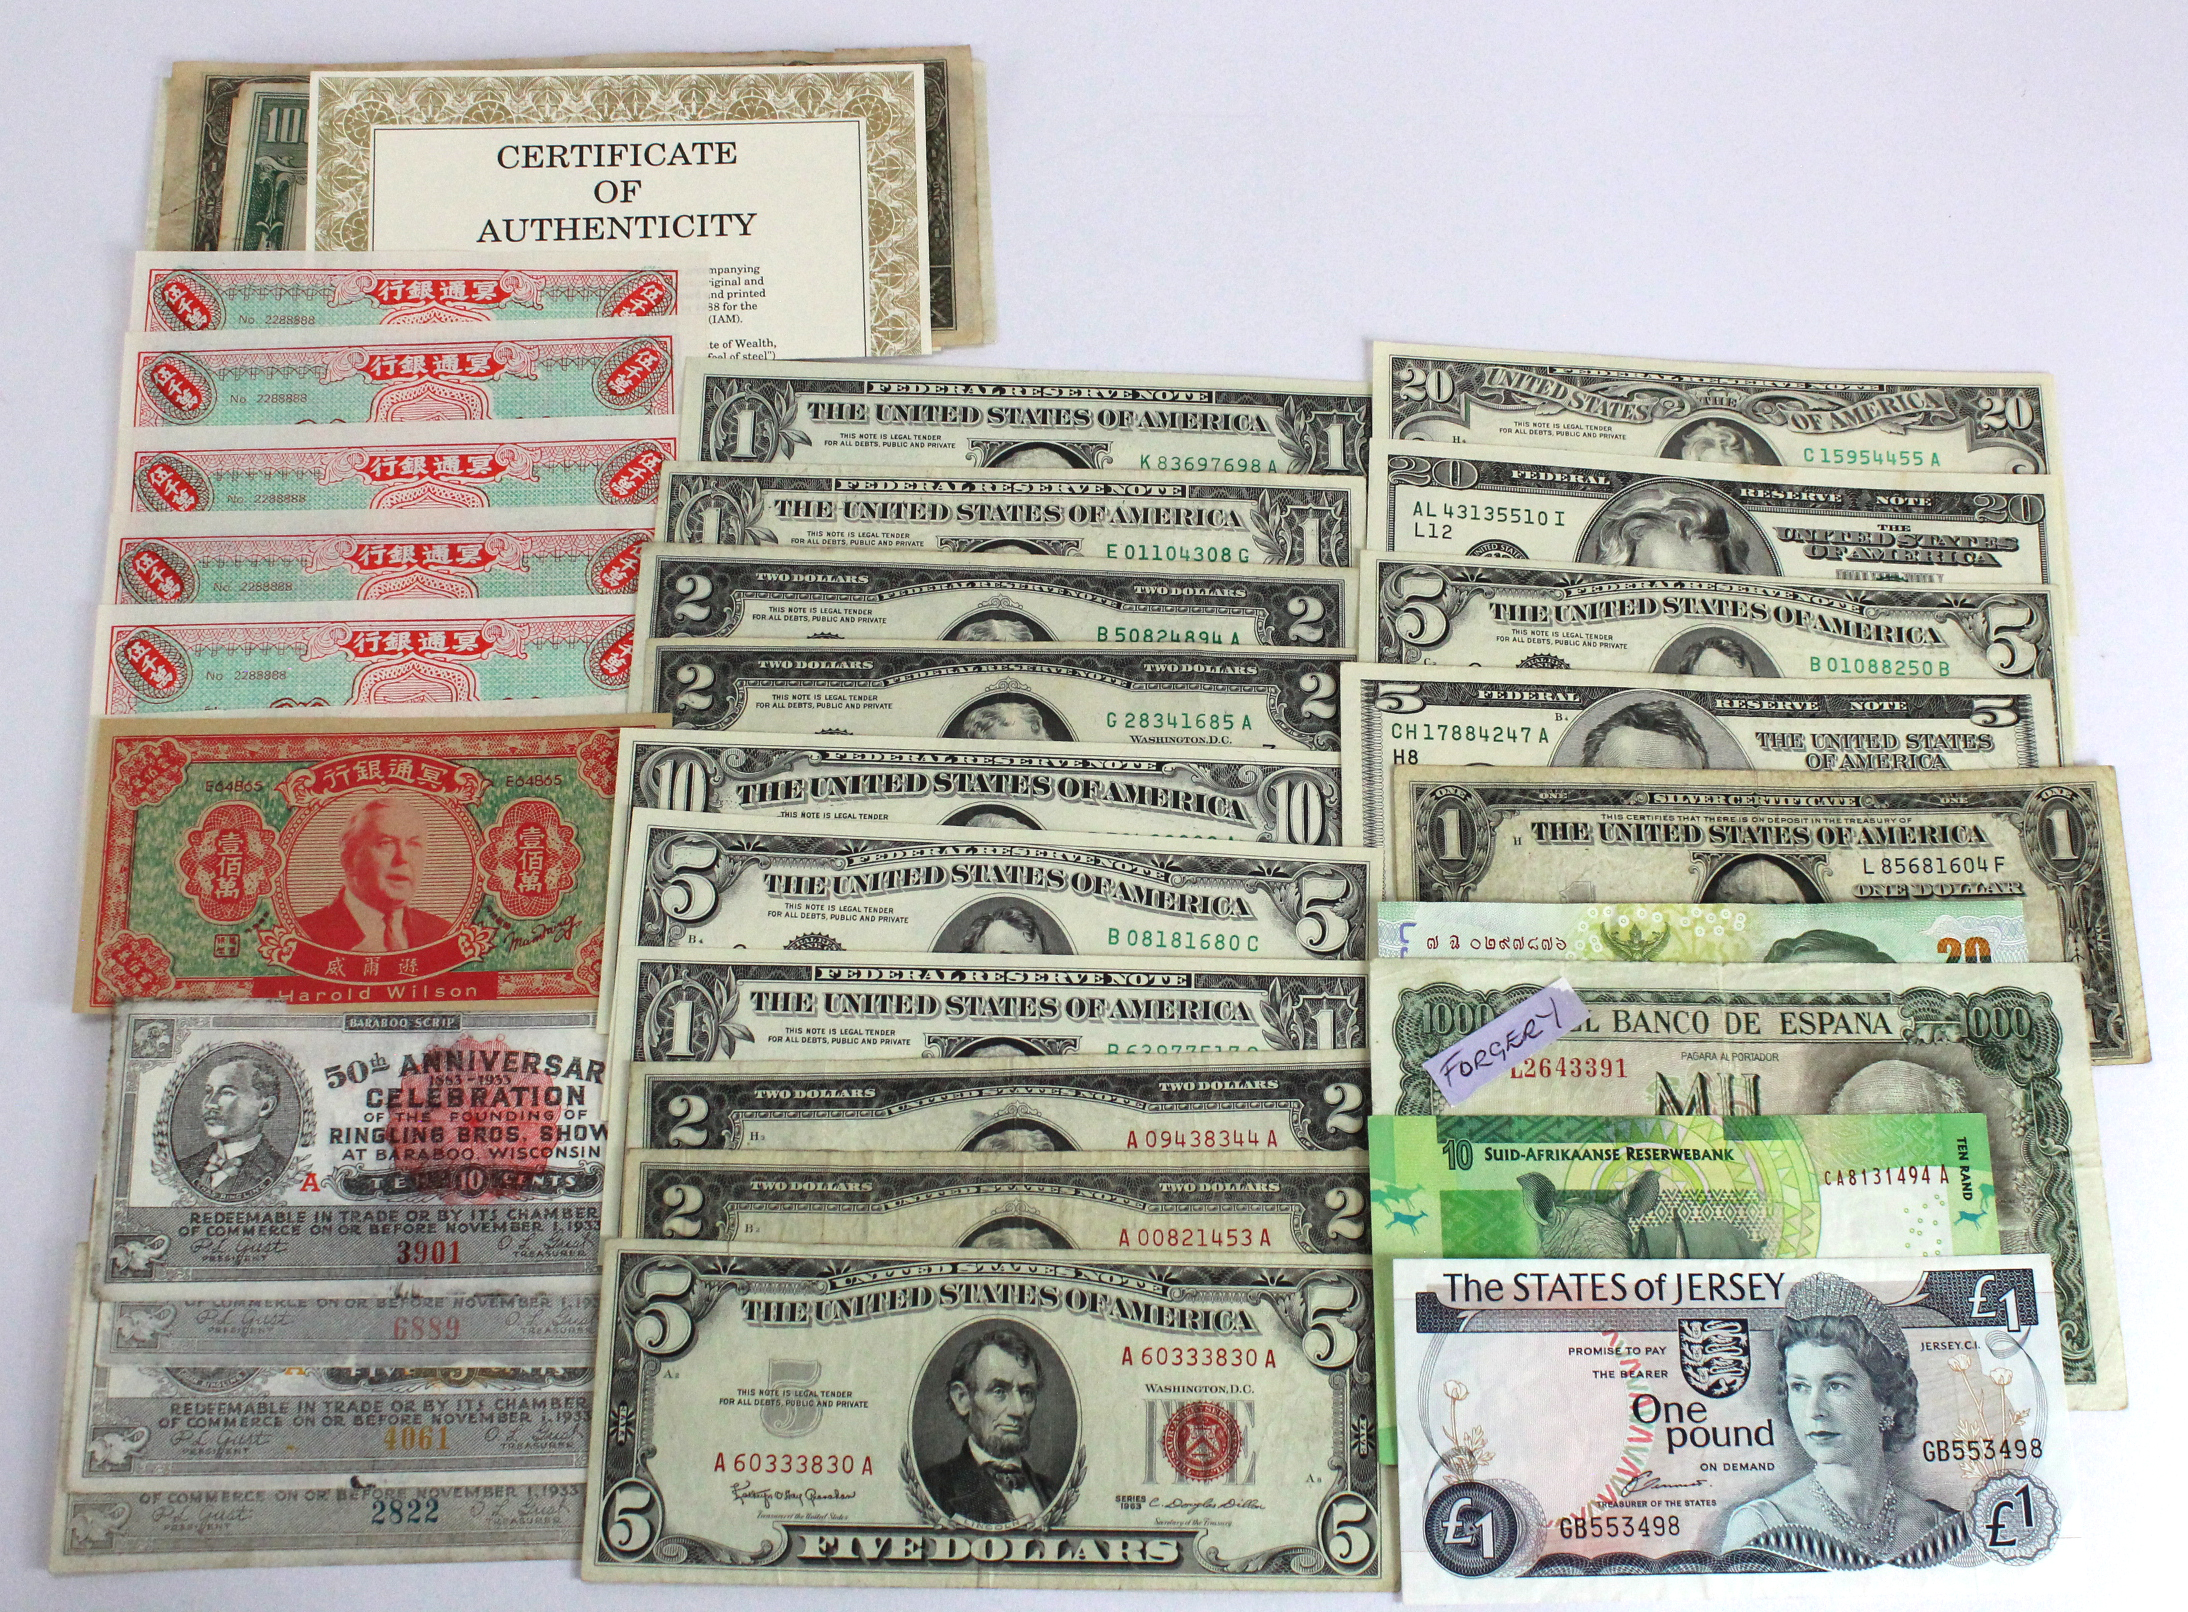 World (39), Cambodia, Cuba, Guernsey, Ireland, Jersey, South Africa, Spain, Thailand, USA, Disney - Image 2 of 2